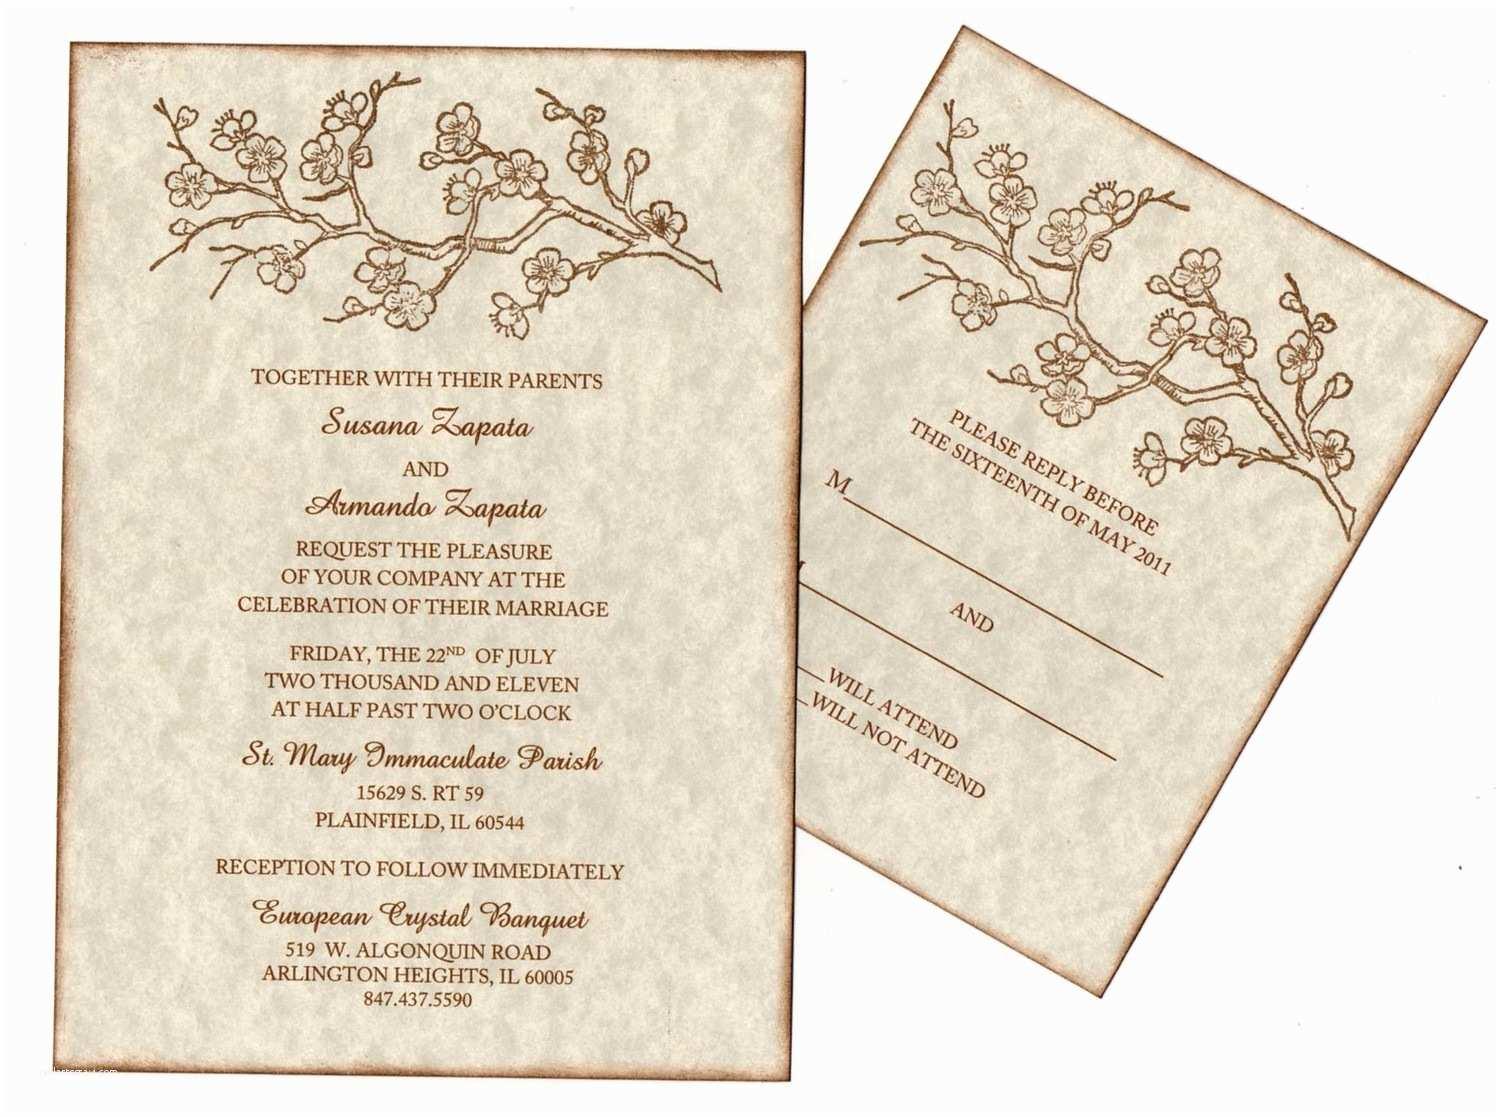 Indian Wedding Invitations Usa Invitations Inspiring Indian Wedding Invitations for